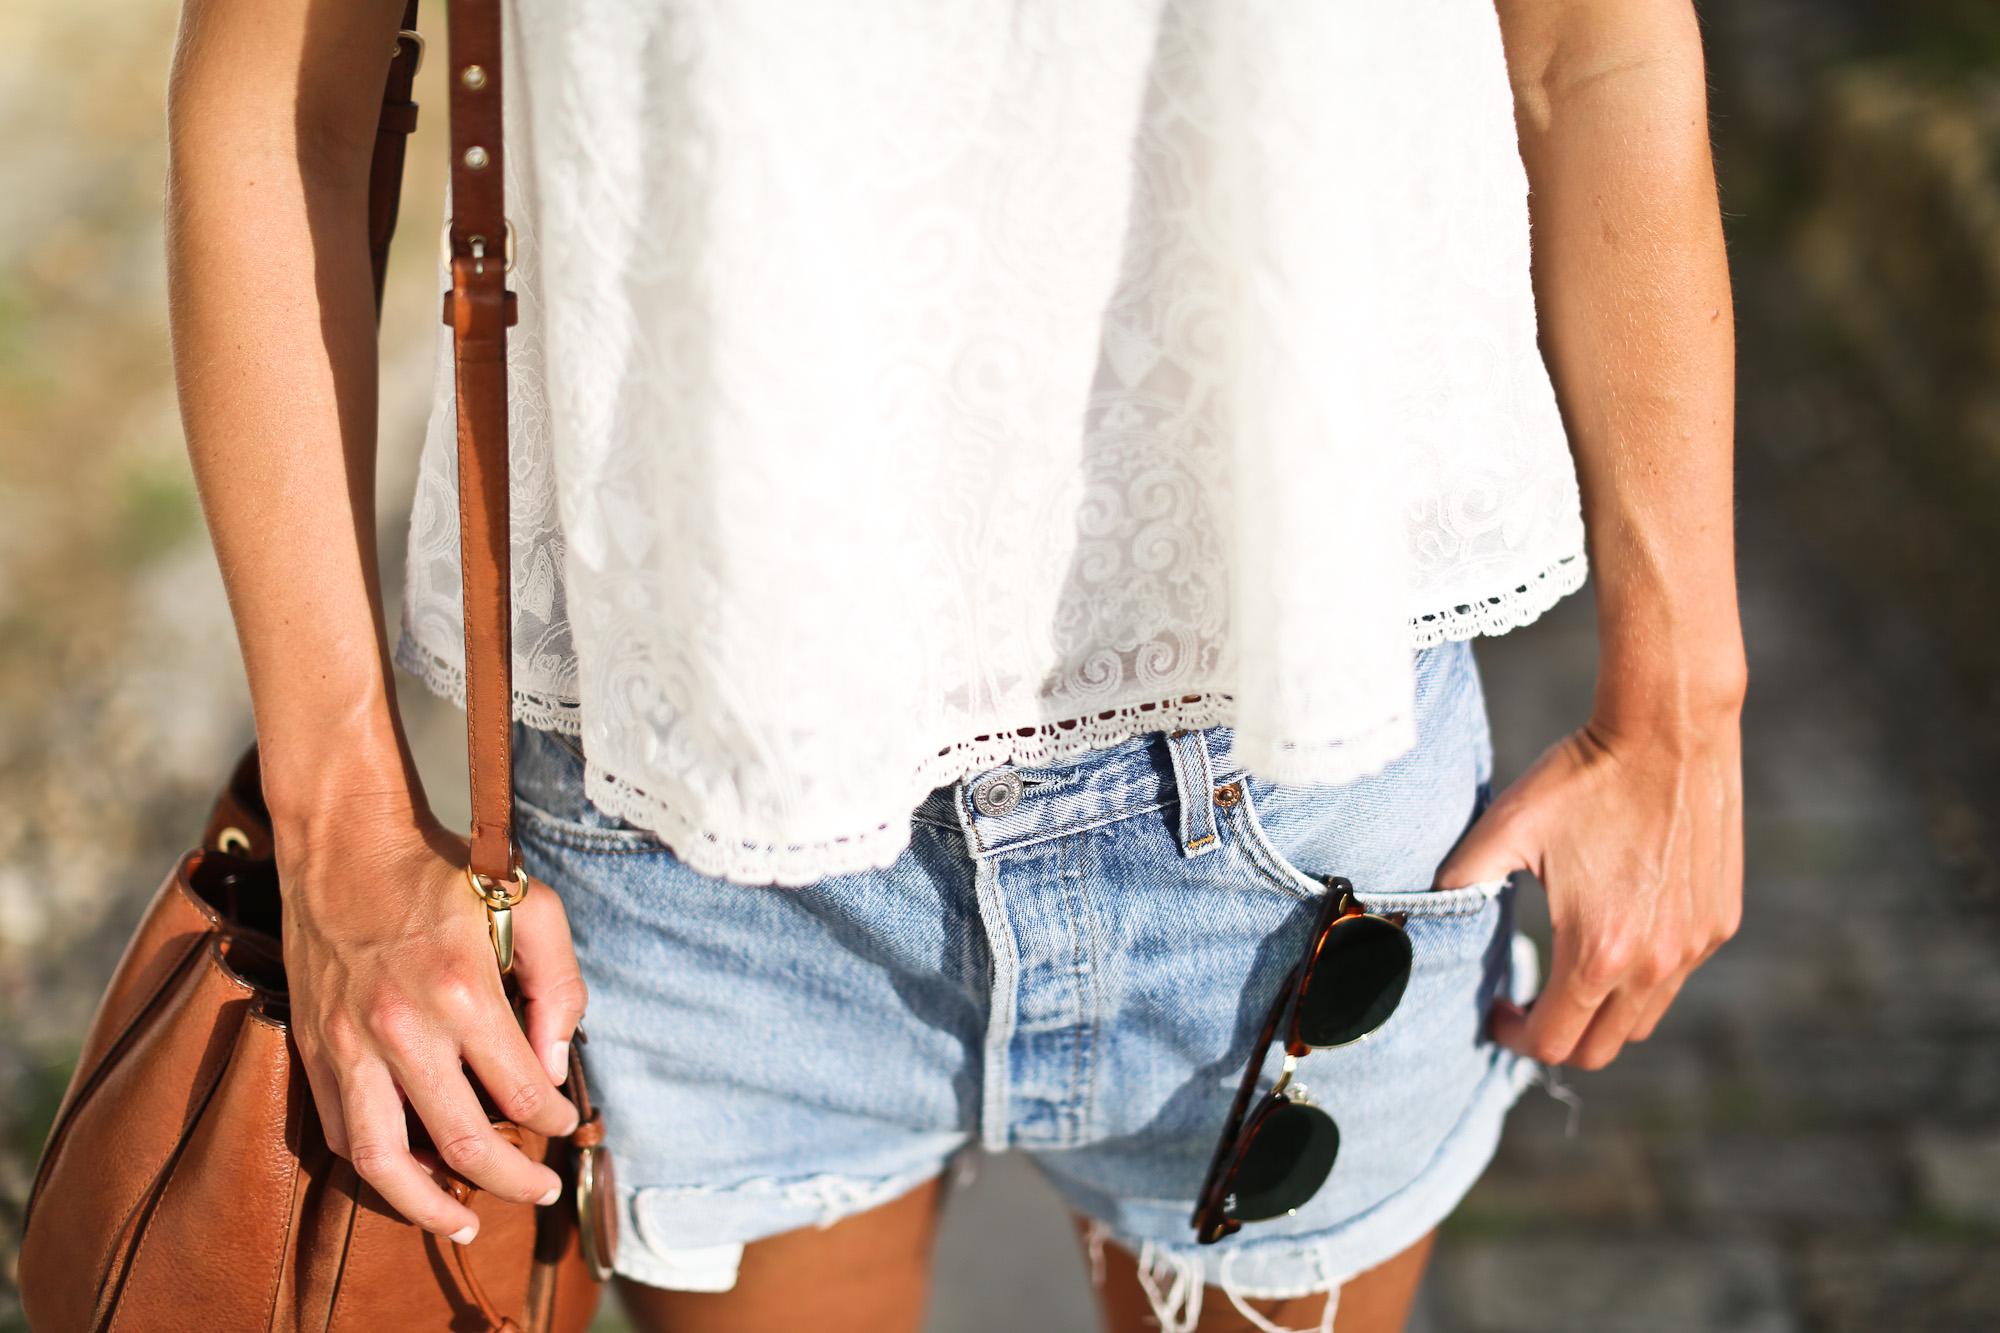 Clochet_streetstyle_levis_501_vintage_shorts_leather_fedora_hat-7